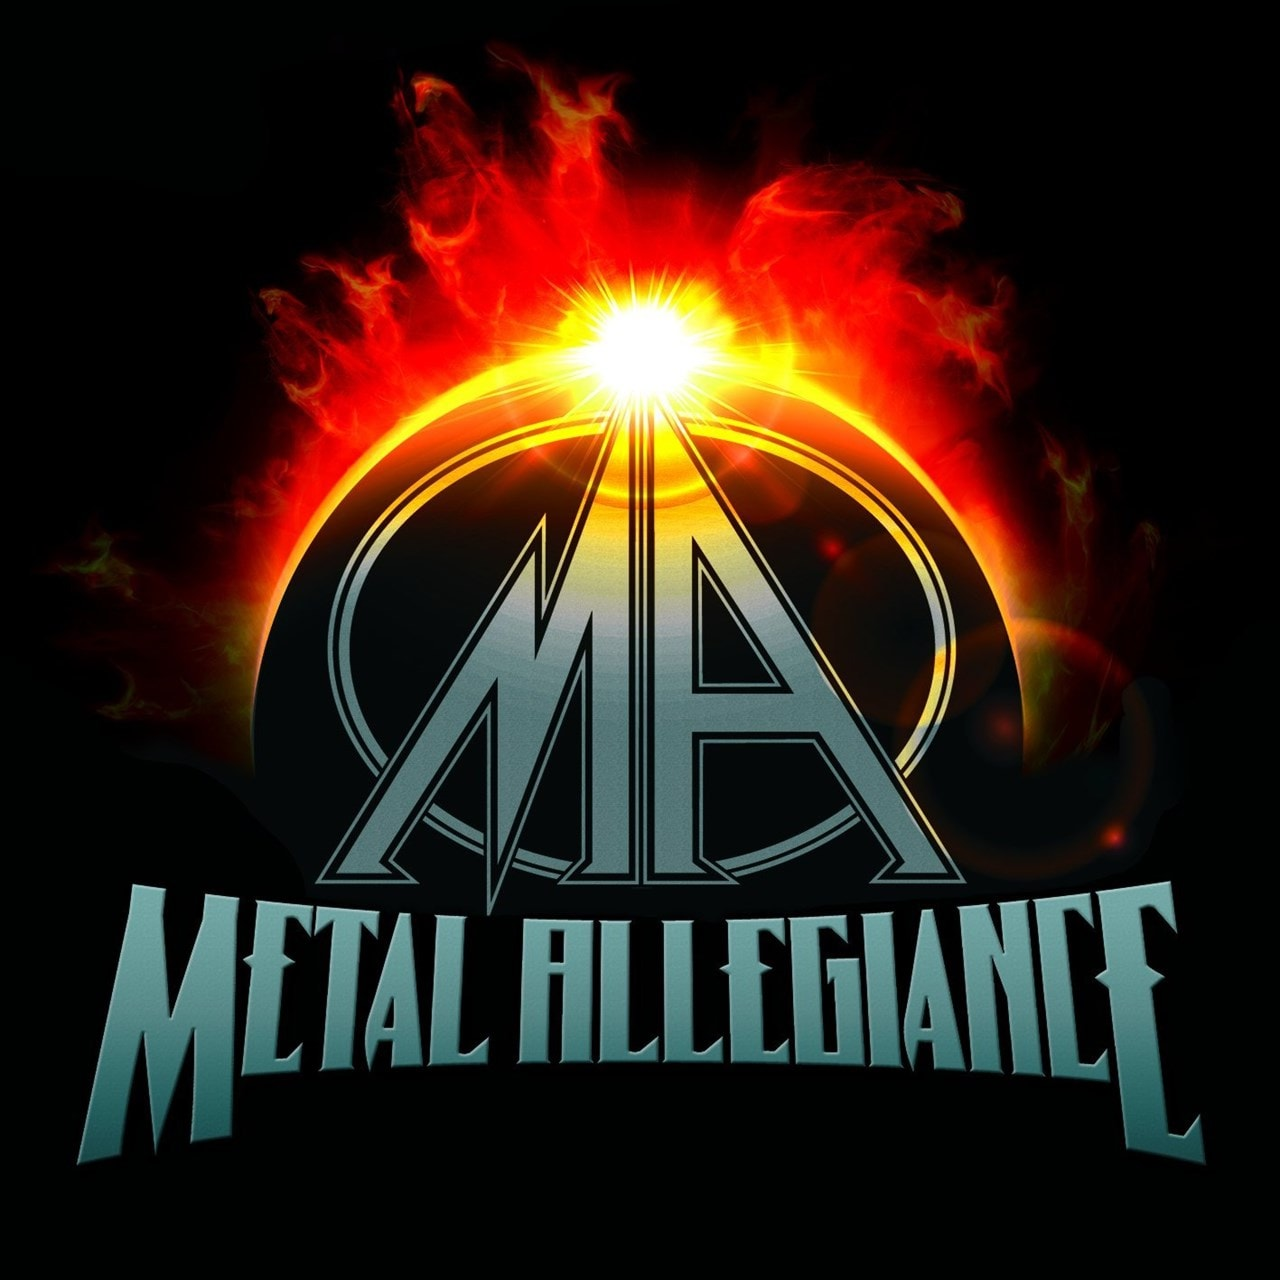 Metal Allegiance - 1